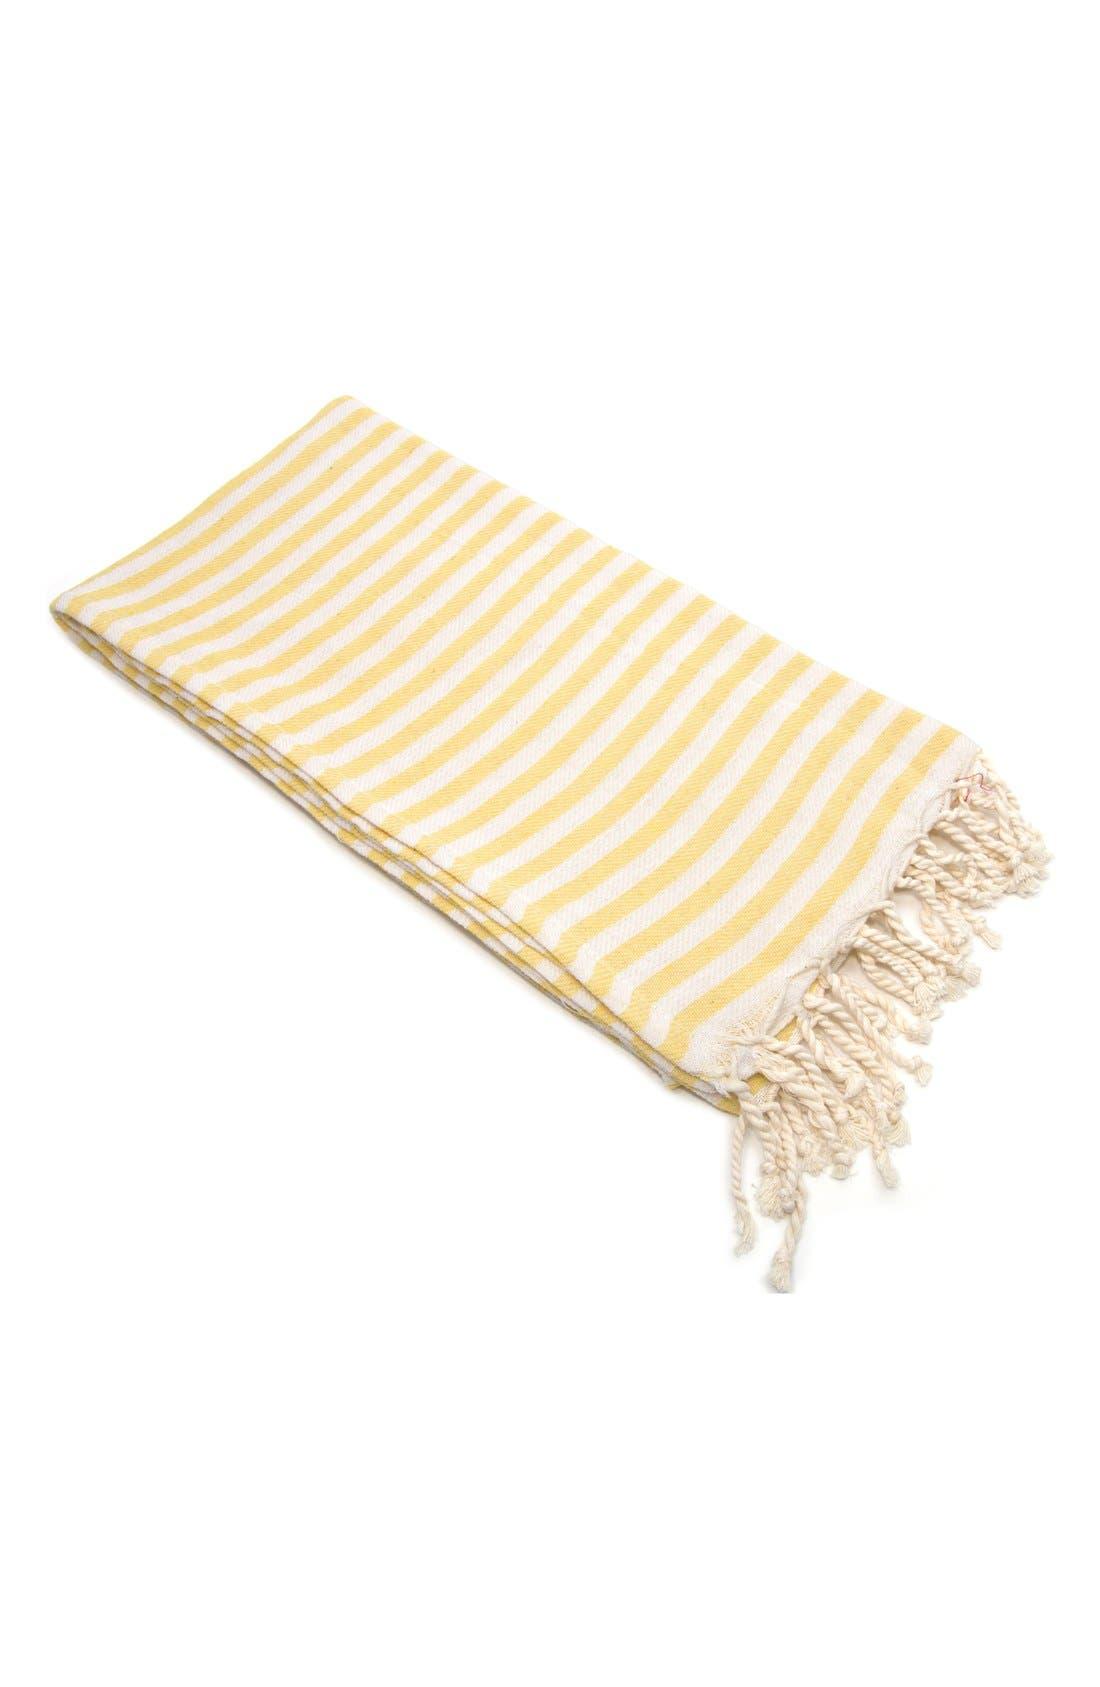 'Fun in the Sun' Turkish Pestemal Towel,                         Main,                         color, Sunshine Yellow